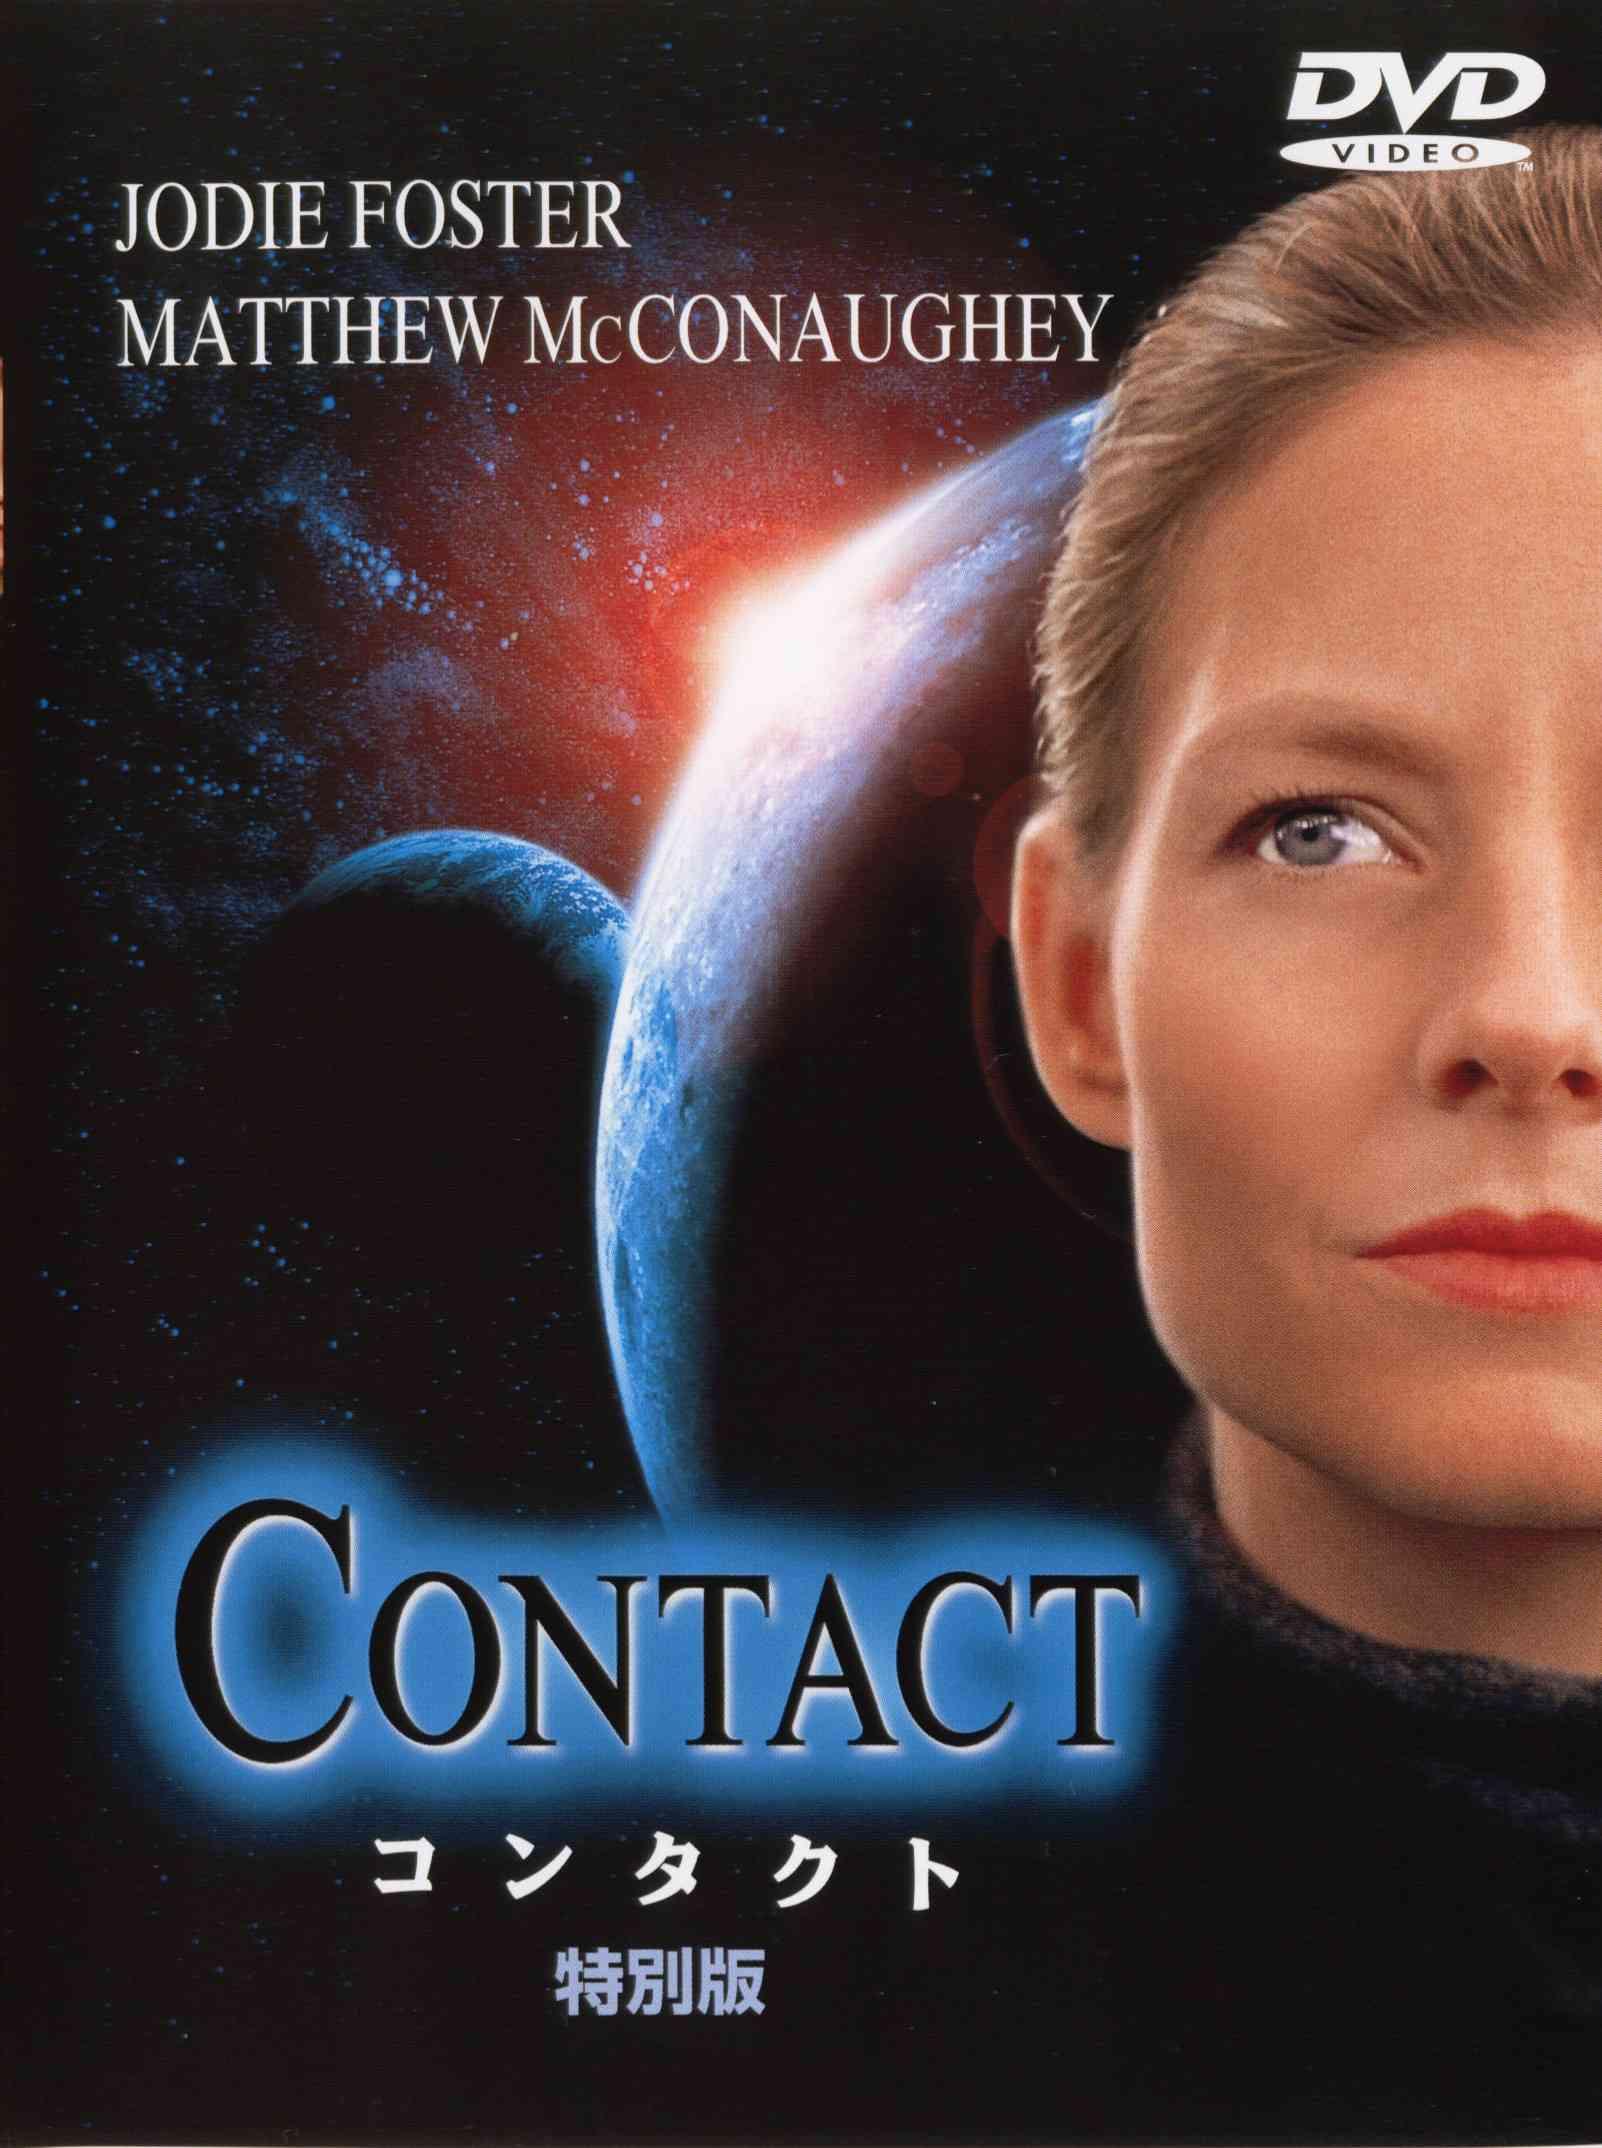 Contact01.jpg